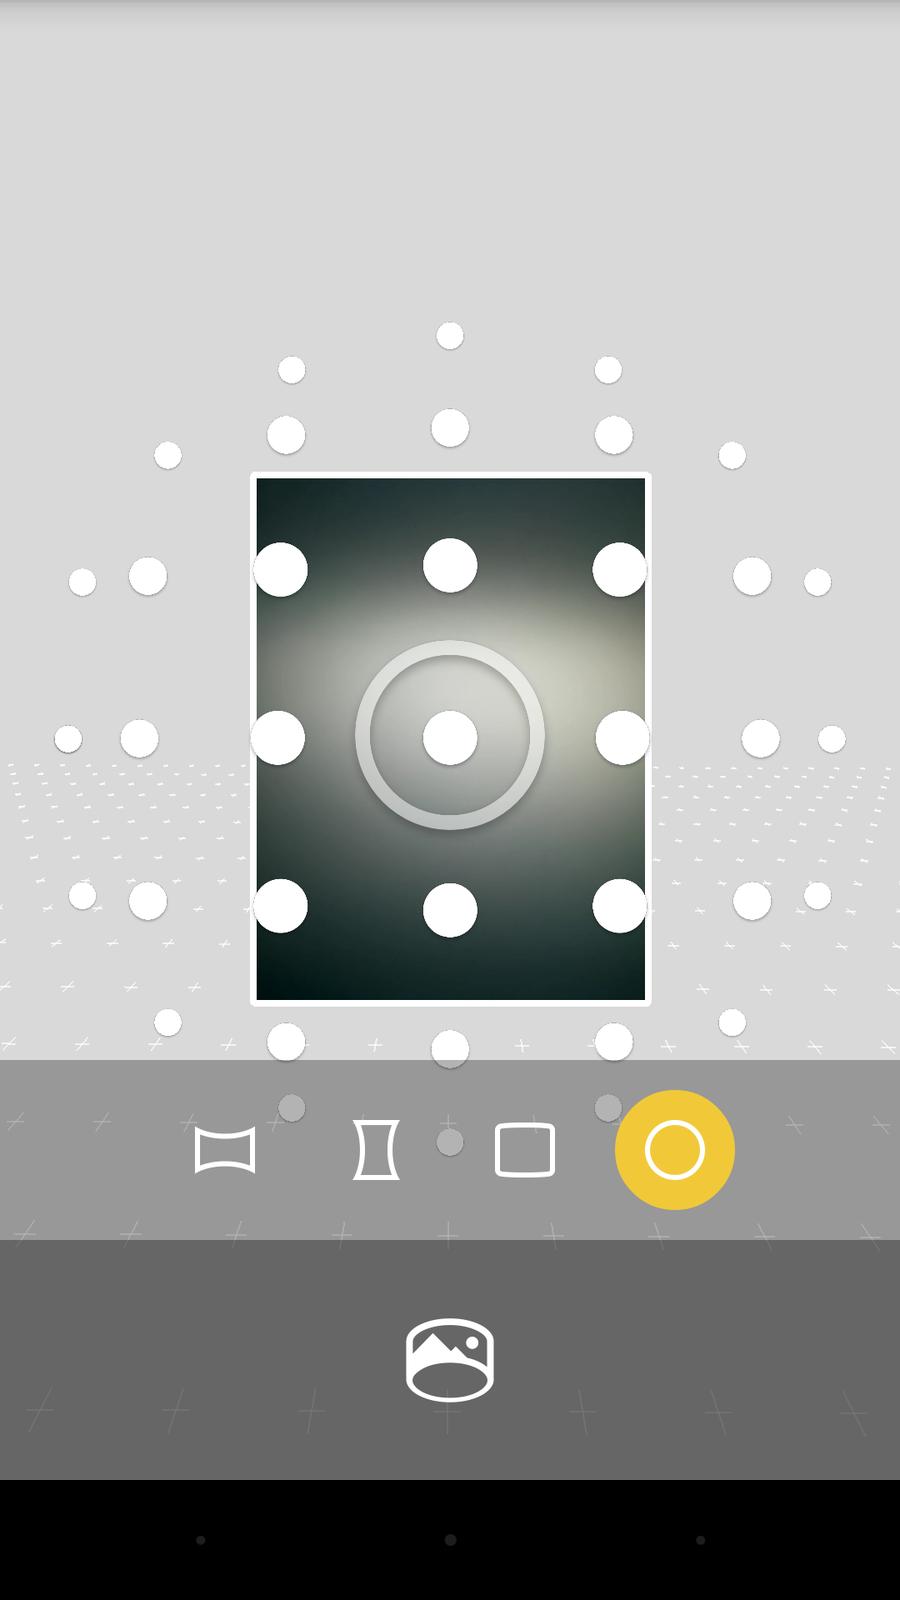 google-kamera-2.3-panorama-2.png